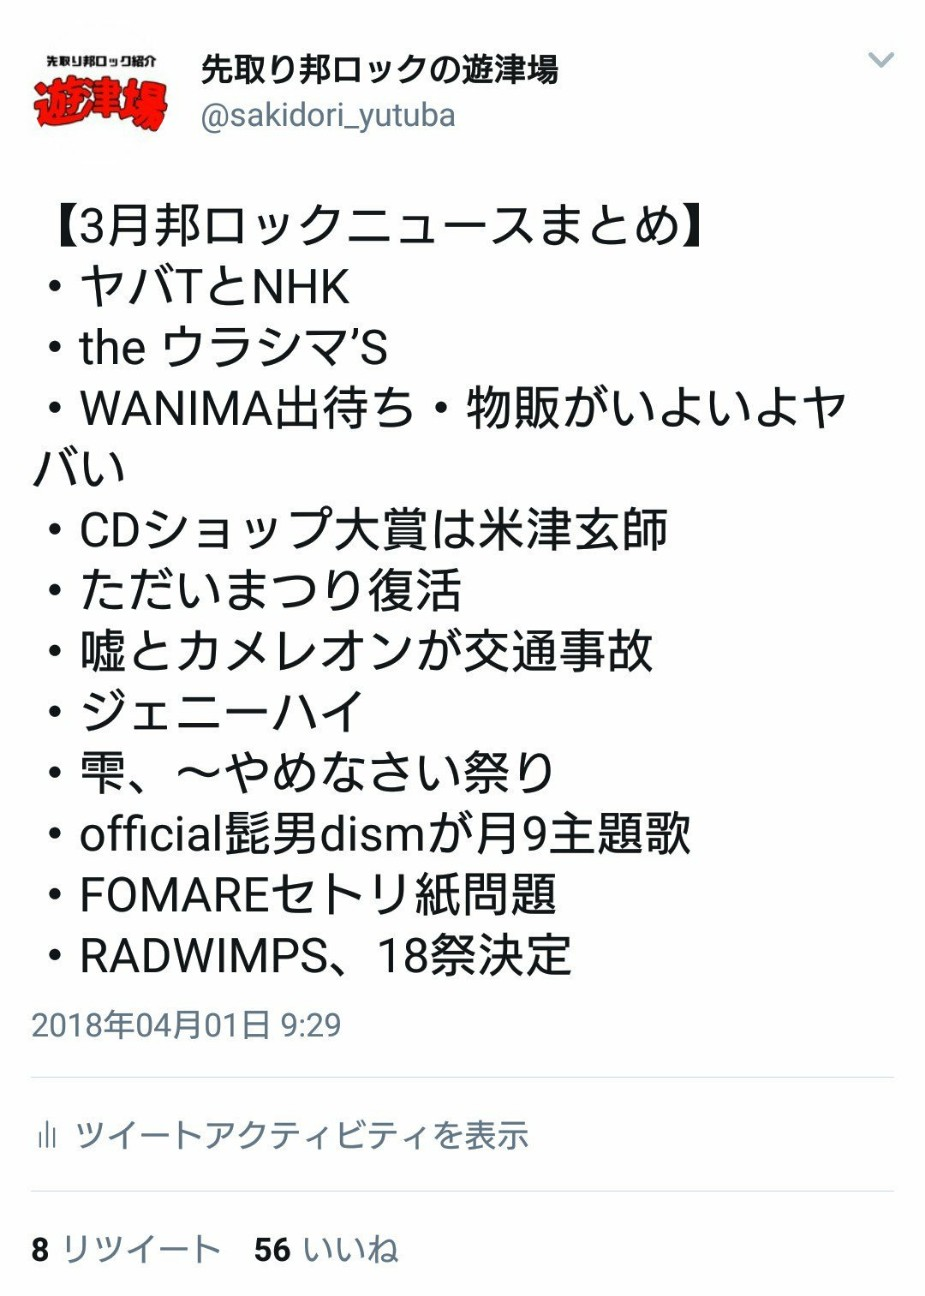 f:id:sakidoriyutsubarock:20181213223441j:plain